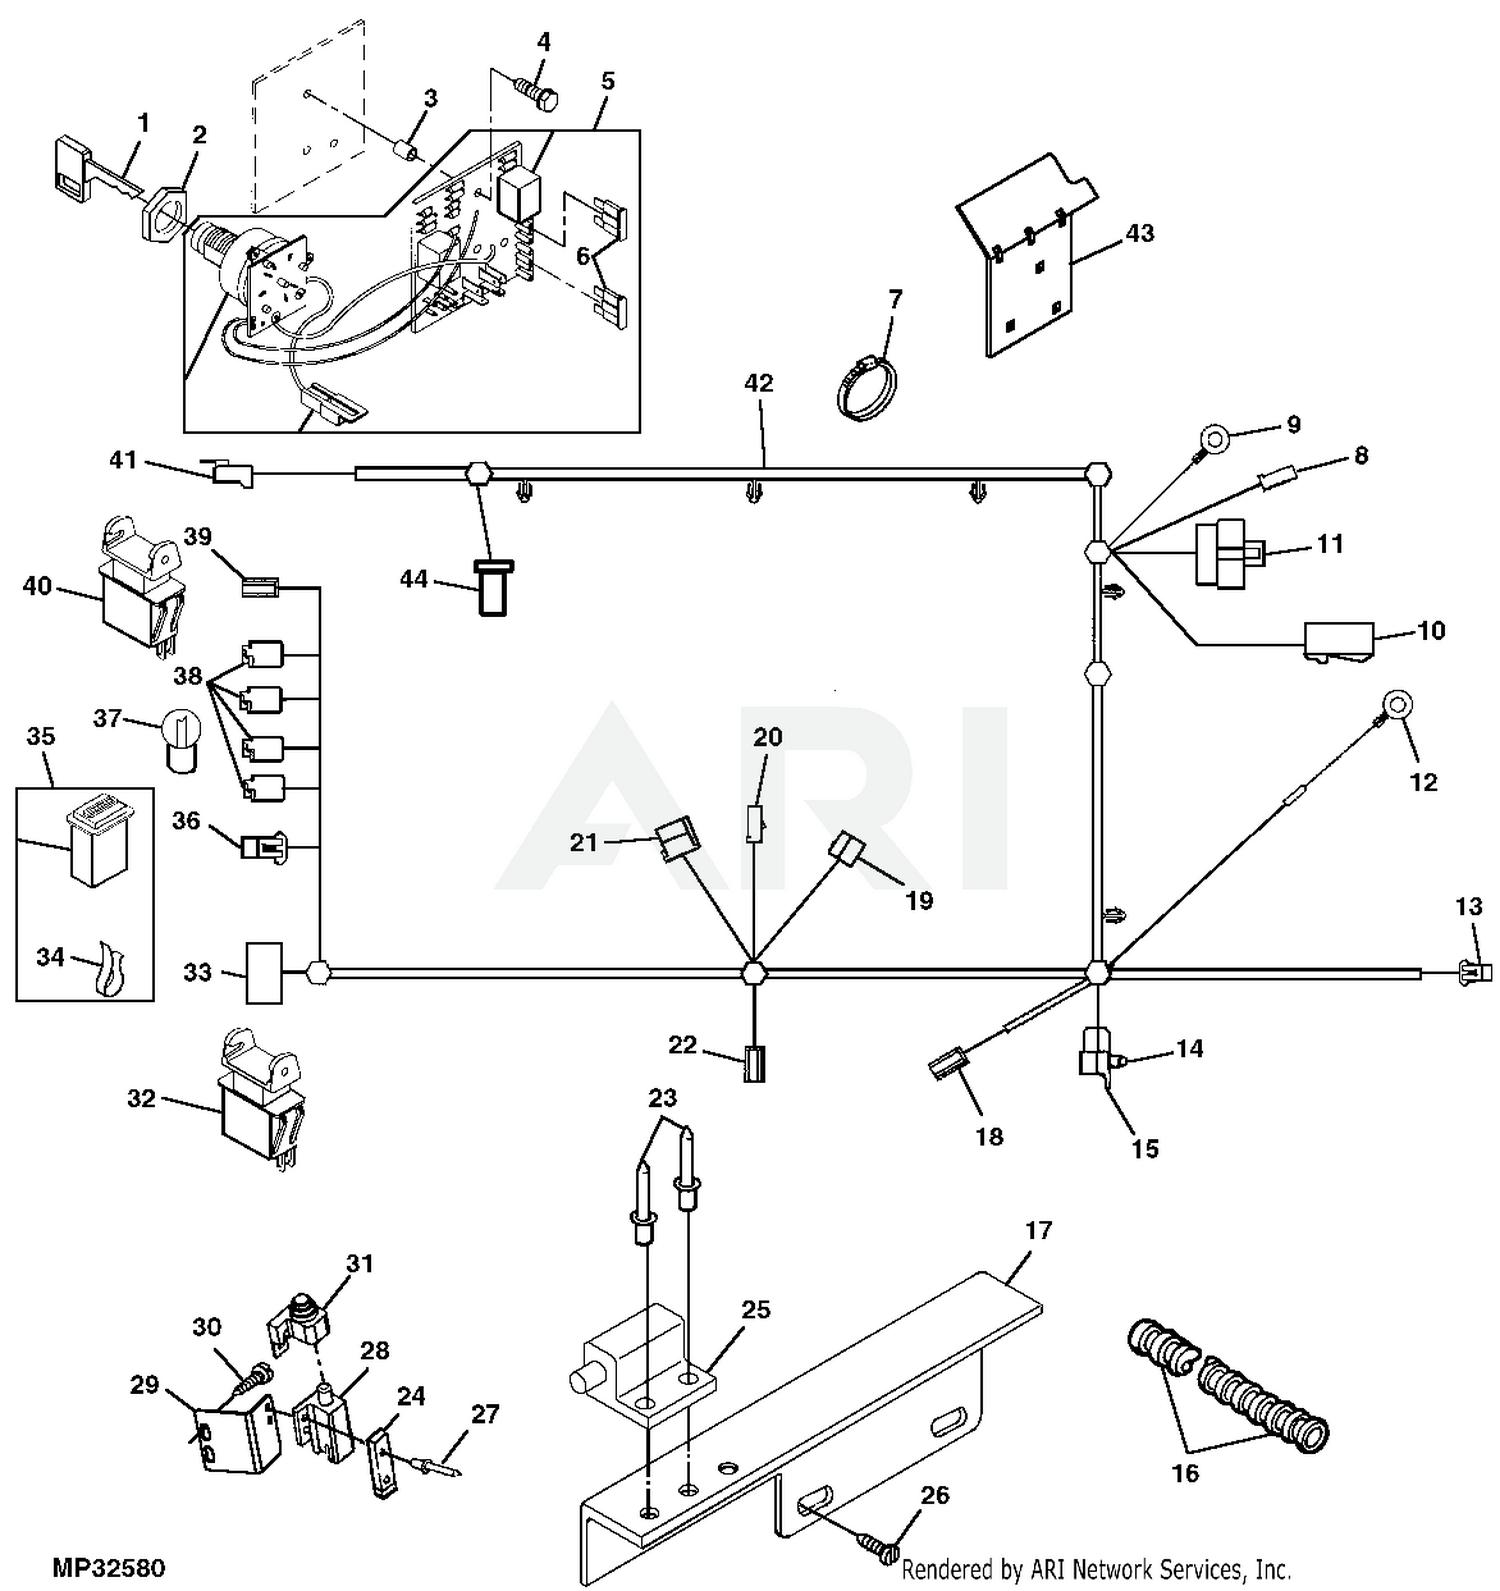 John Deere GX345 Lawn & Garden Tractor With 54-IN Convertible Mower Deck  -PC9078 2002 Model M0G345B105001-110000 GX345 Lawn & Garden Tractor With  54-IN Convertible Mower Deck -PC9078 2003 Model M0G345B110001-120000 GX345  Lawn | Gx345 Wiring Diagram |  | Weingartz